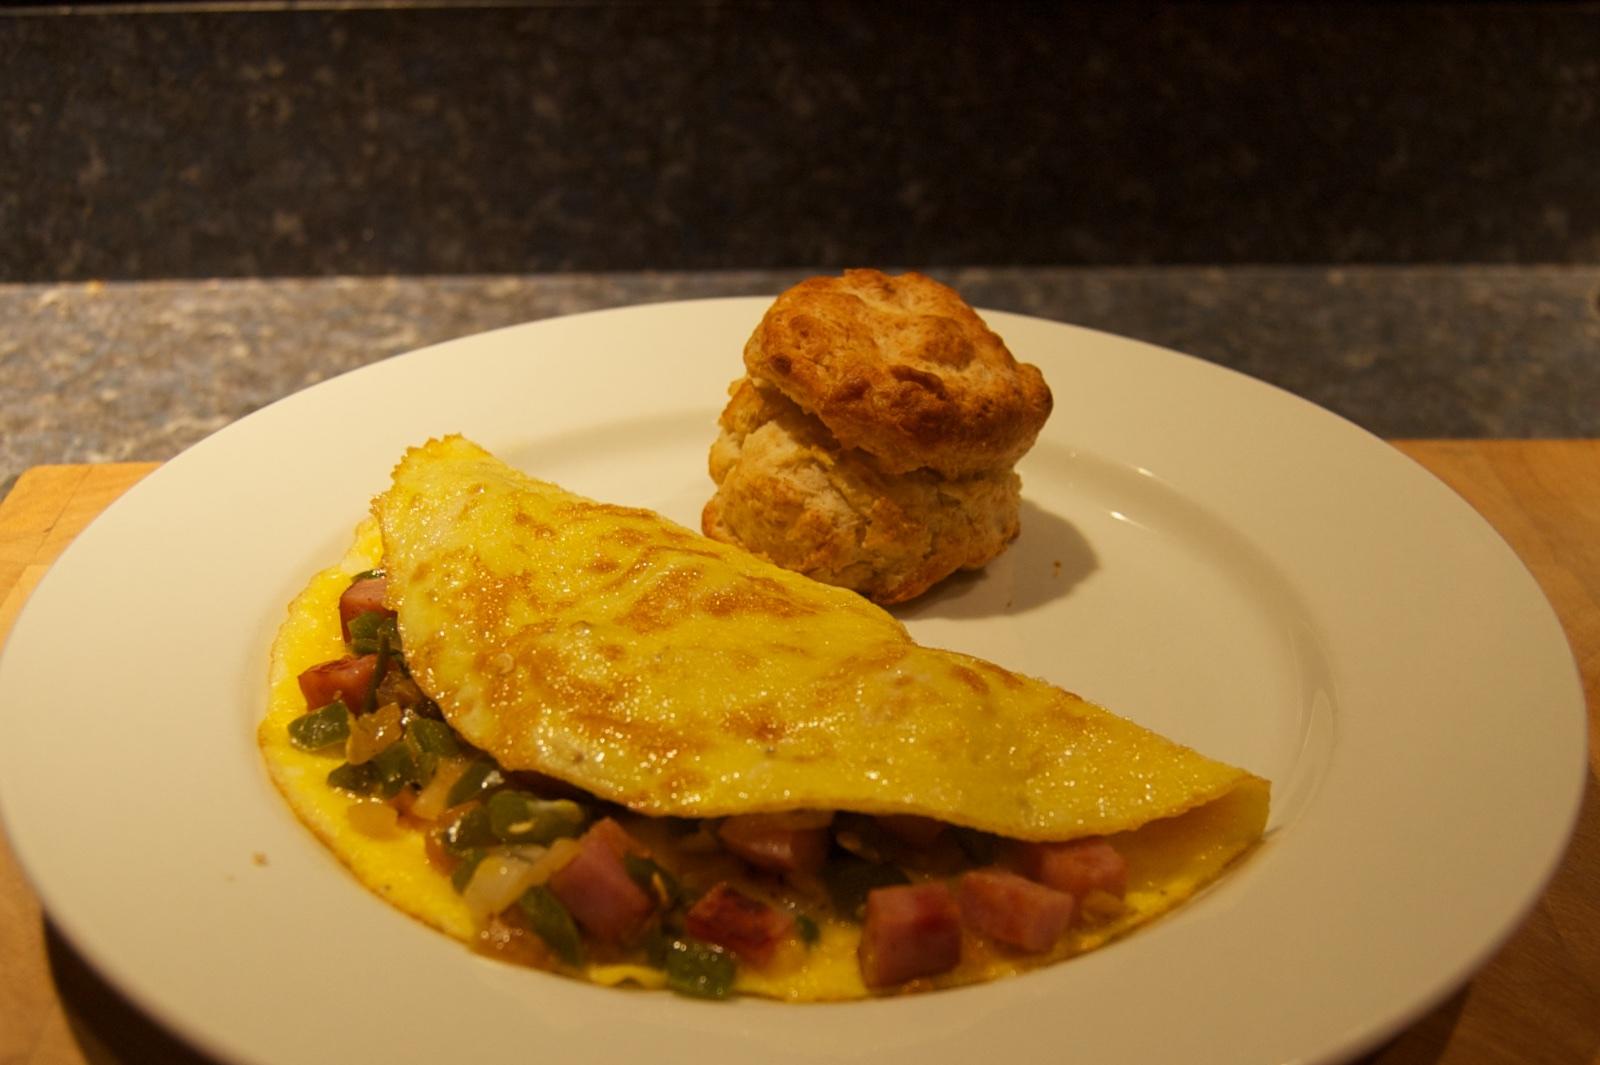 http://blog.rickk.com/food/2015/04/15/ate.2015.04.14.b.jpg